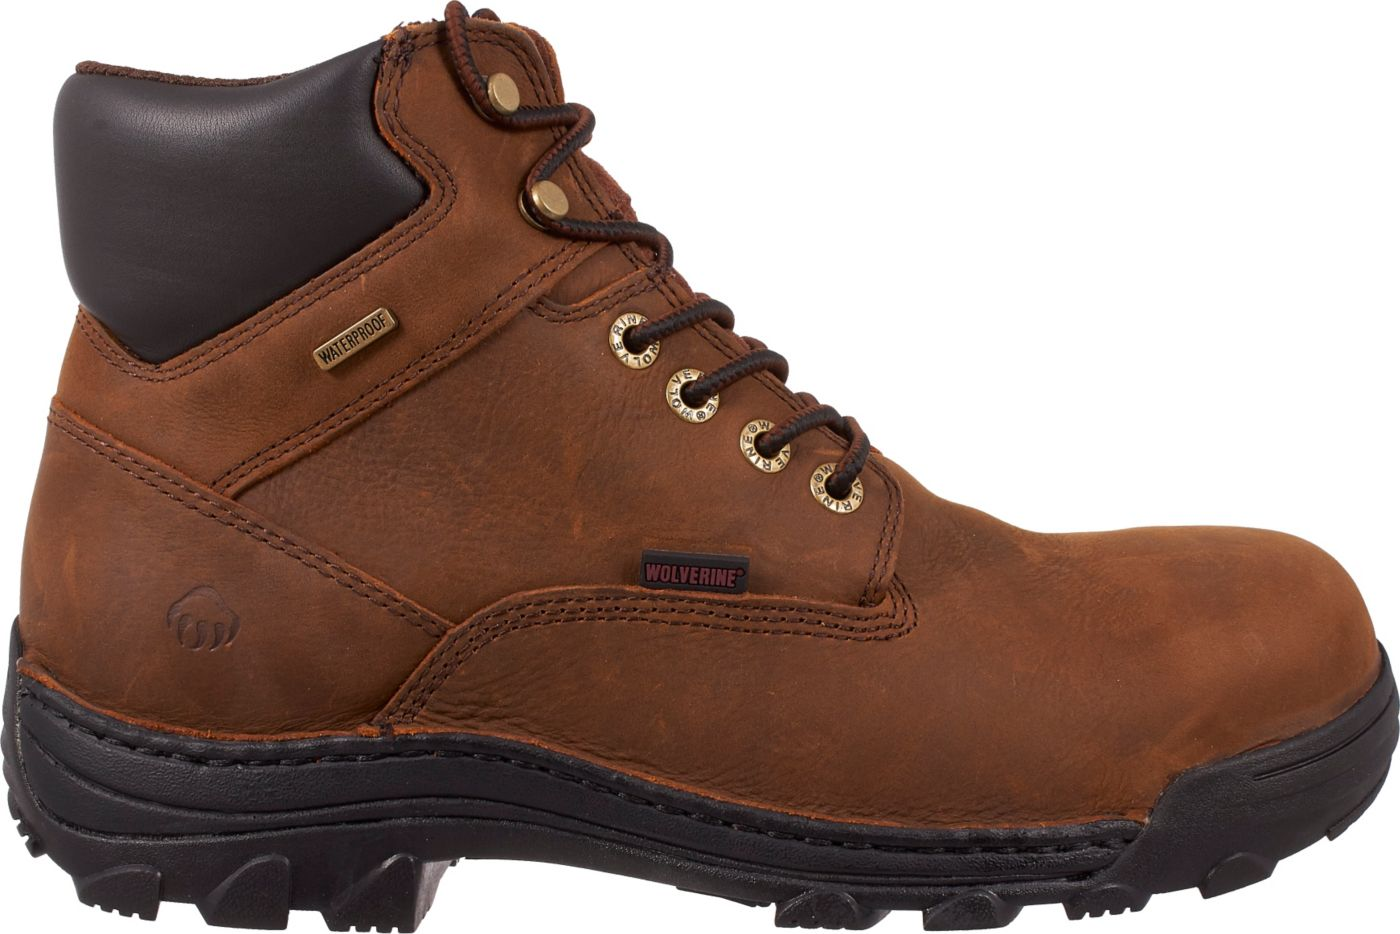 Wolverine Men's Durbin Waterproof Work Boots